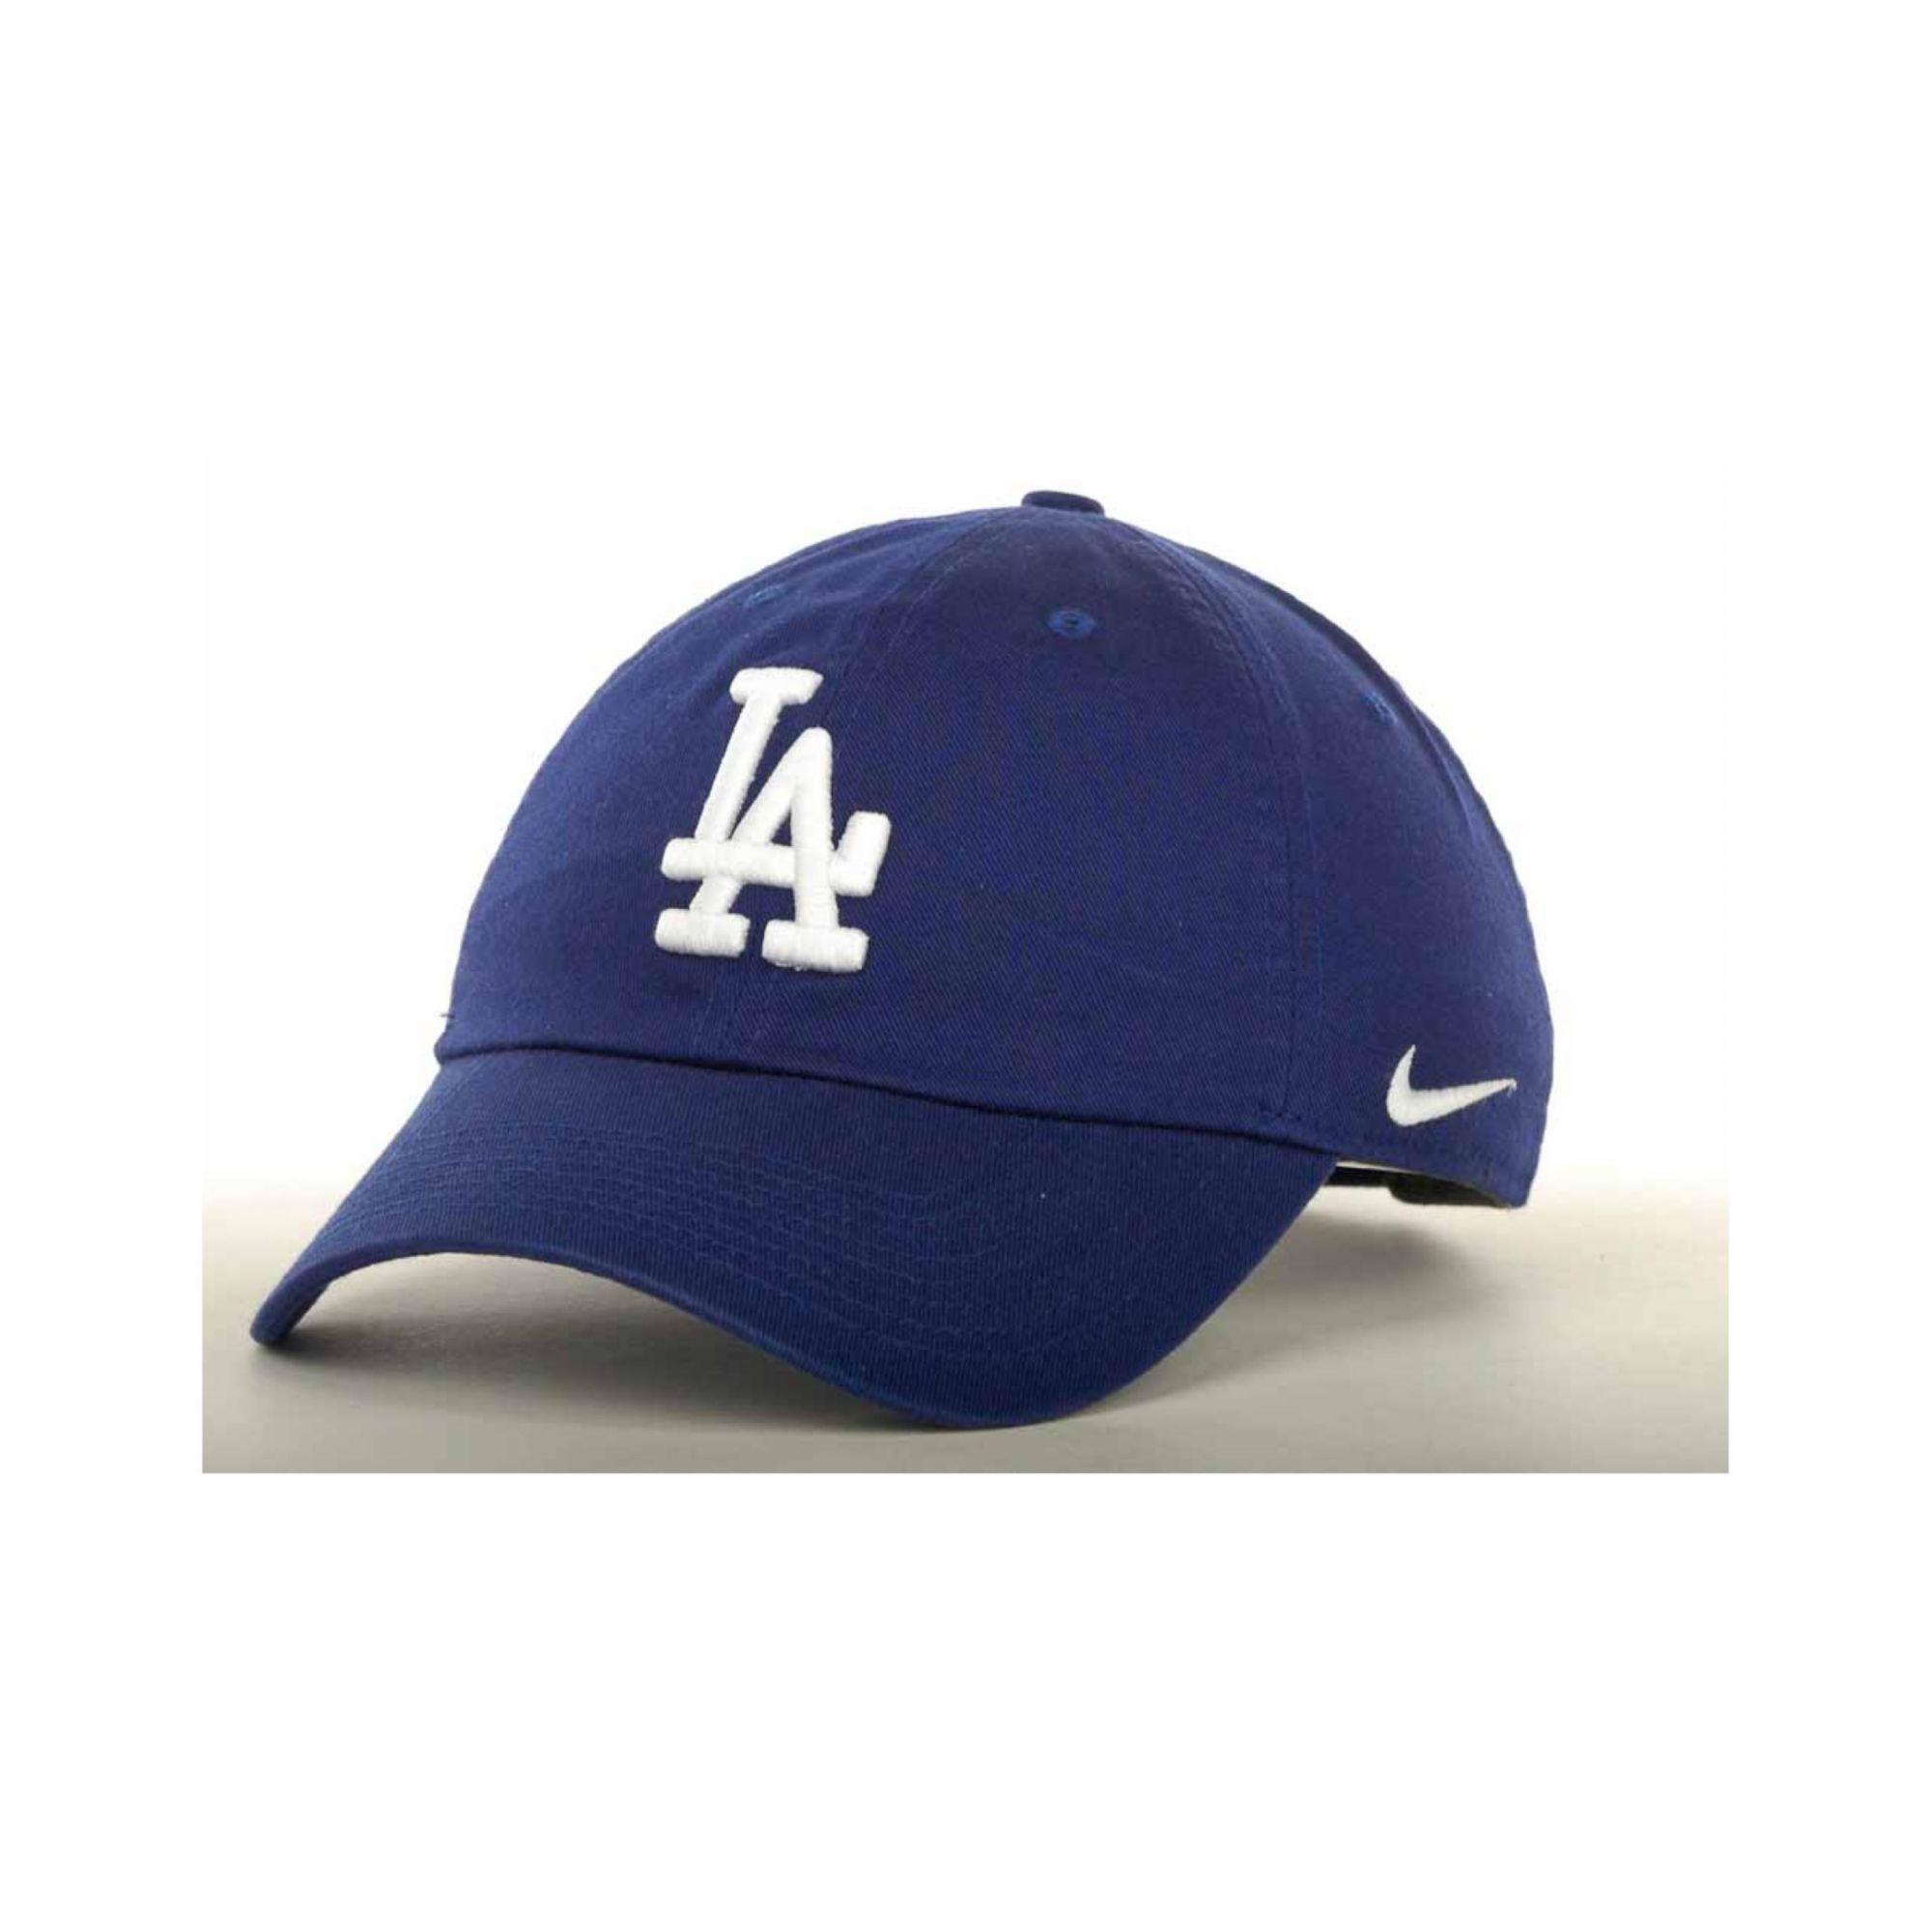 Lyst Nike Womens Los Angeles Dodgers Stadium Cap In Blue 8eb11dd08c